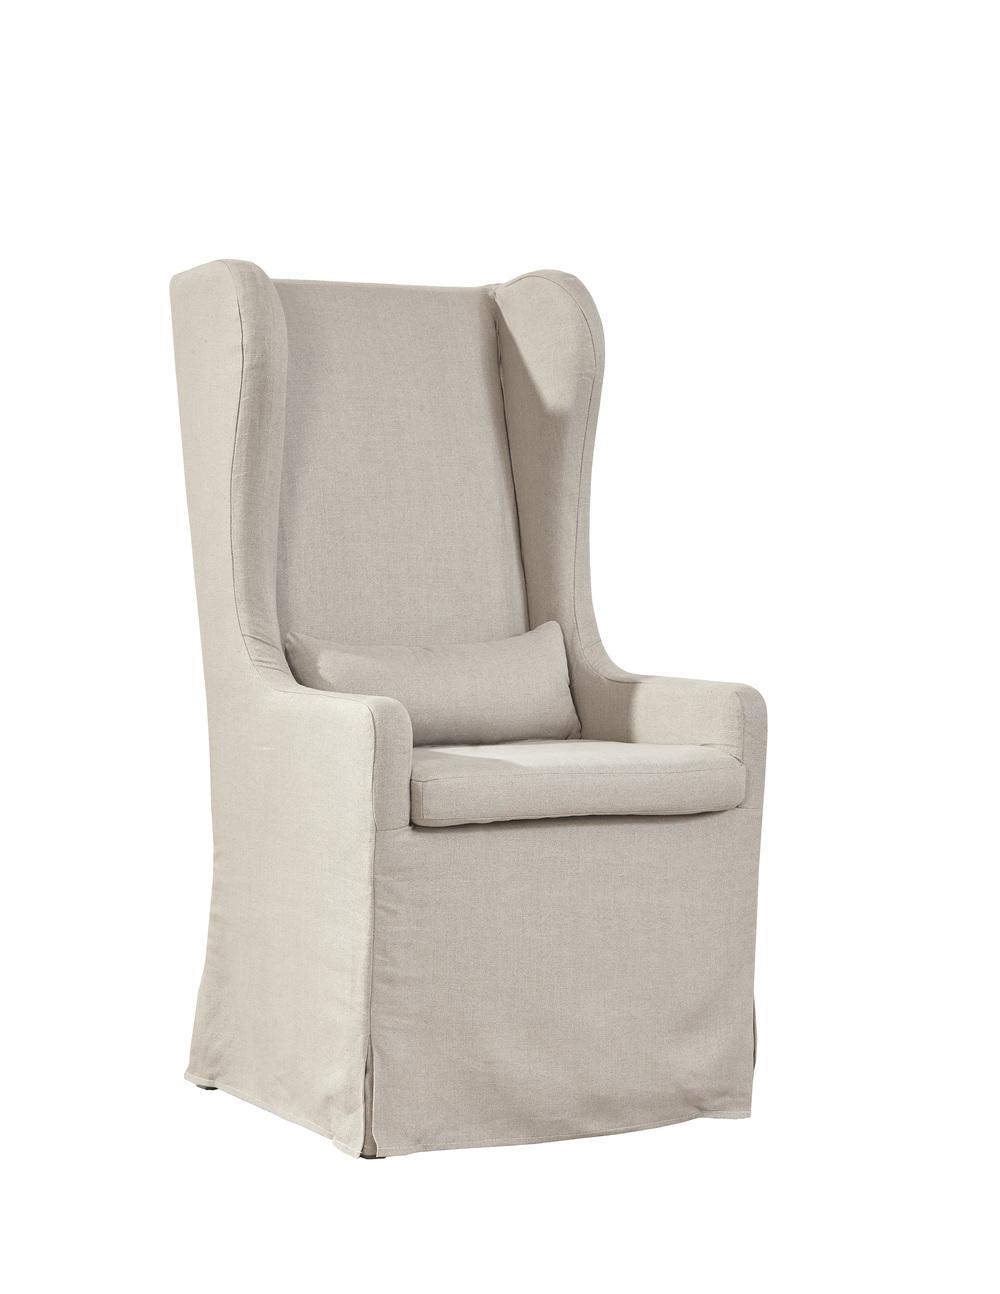 Furniture Classics Limited - Highback Linen Host Chair